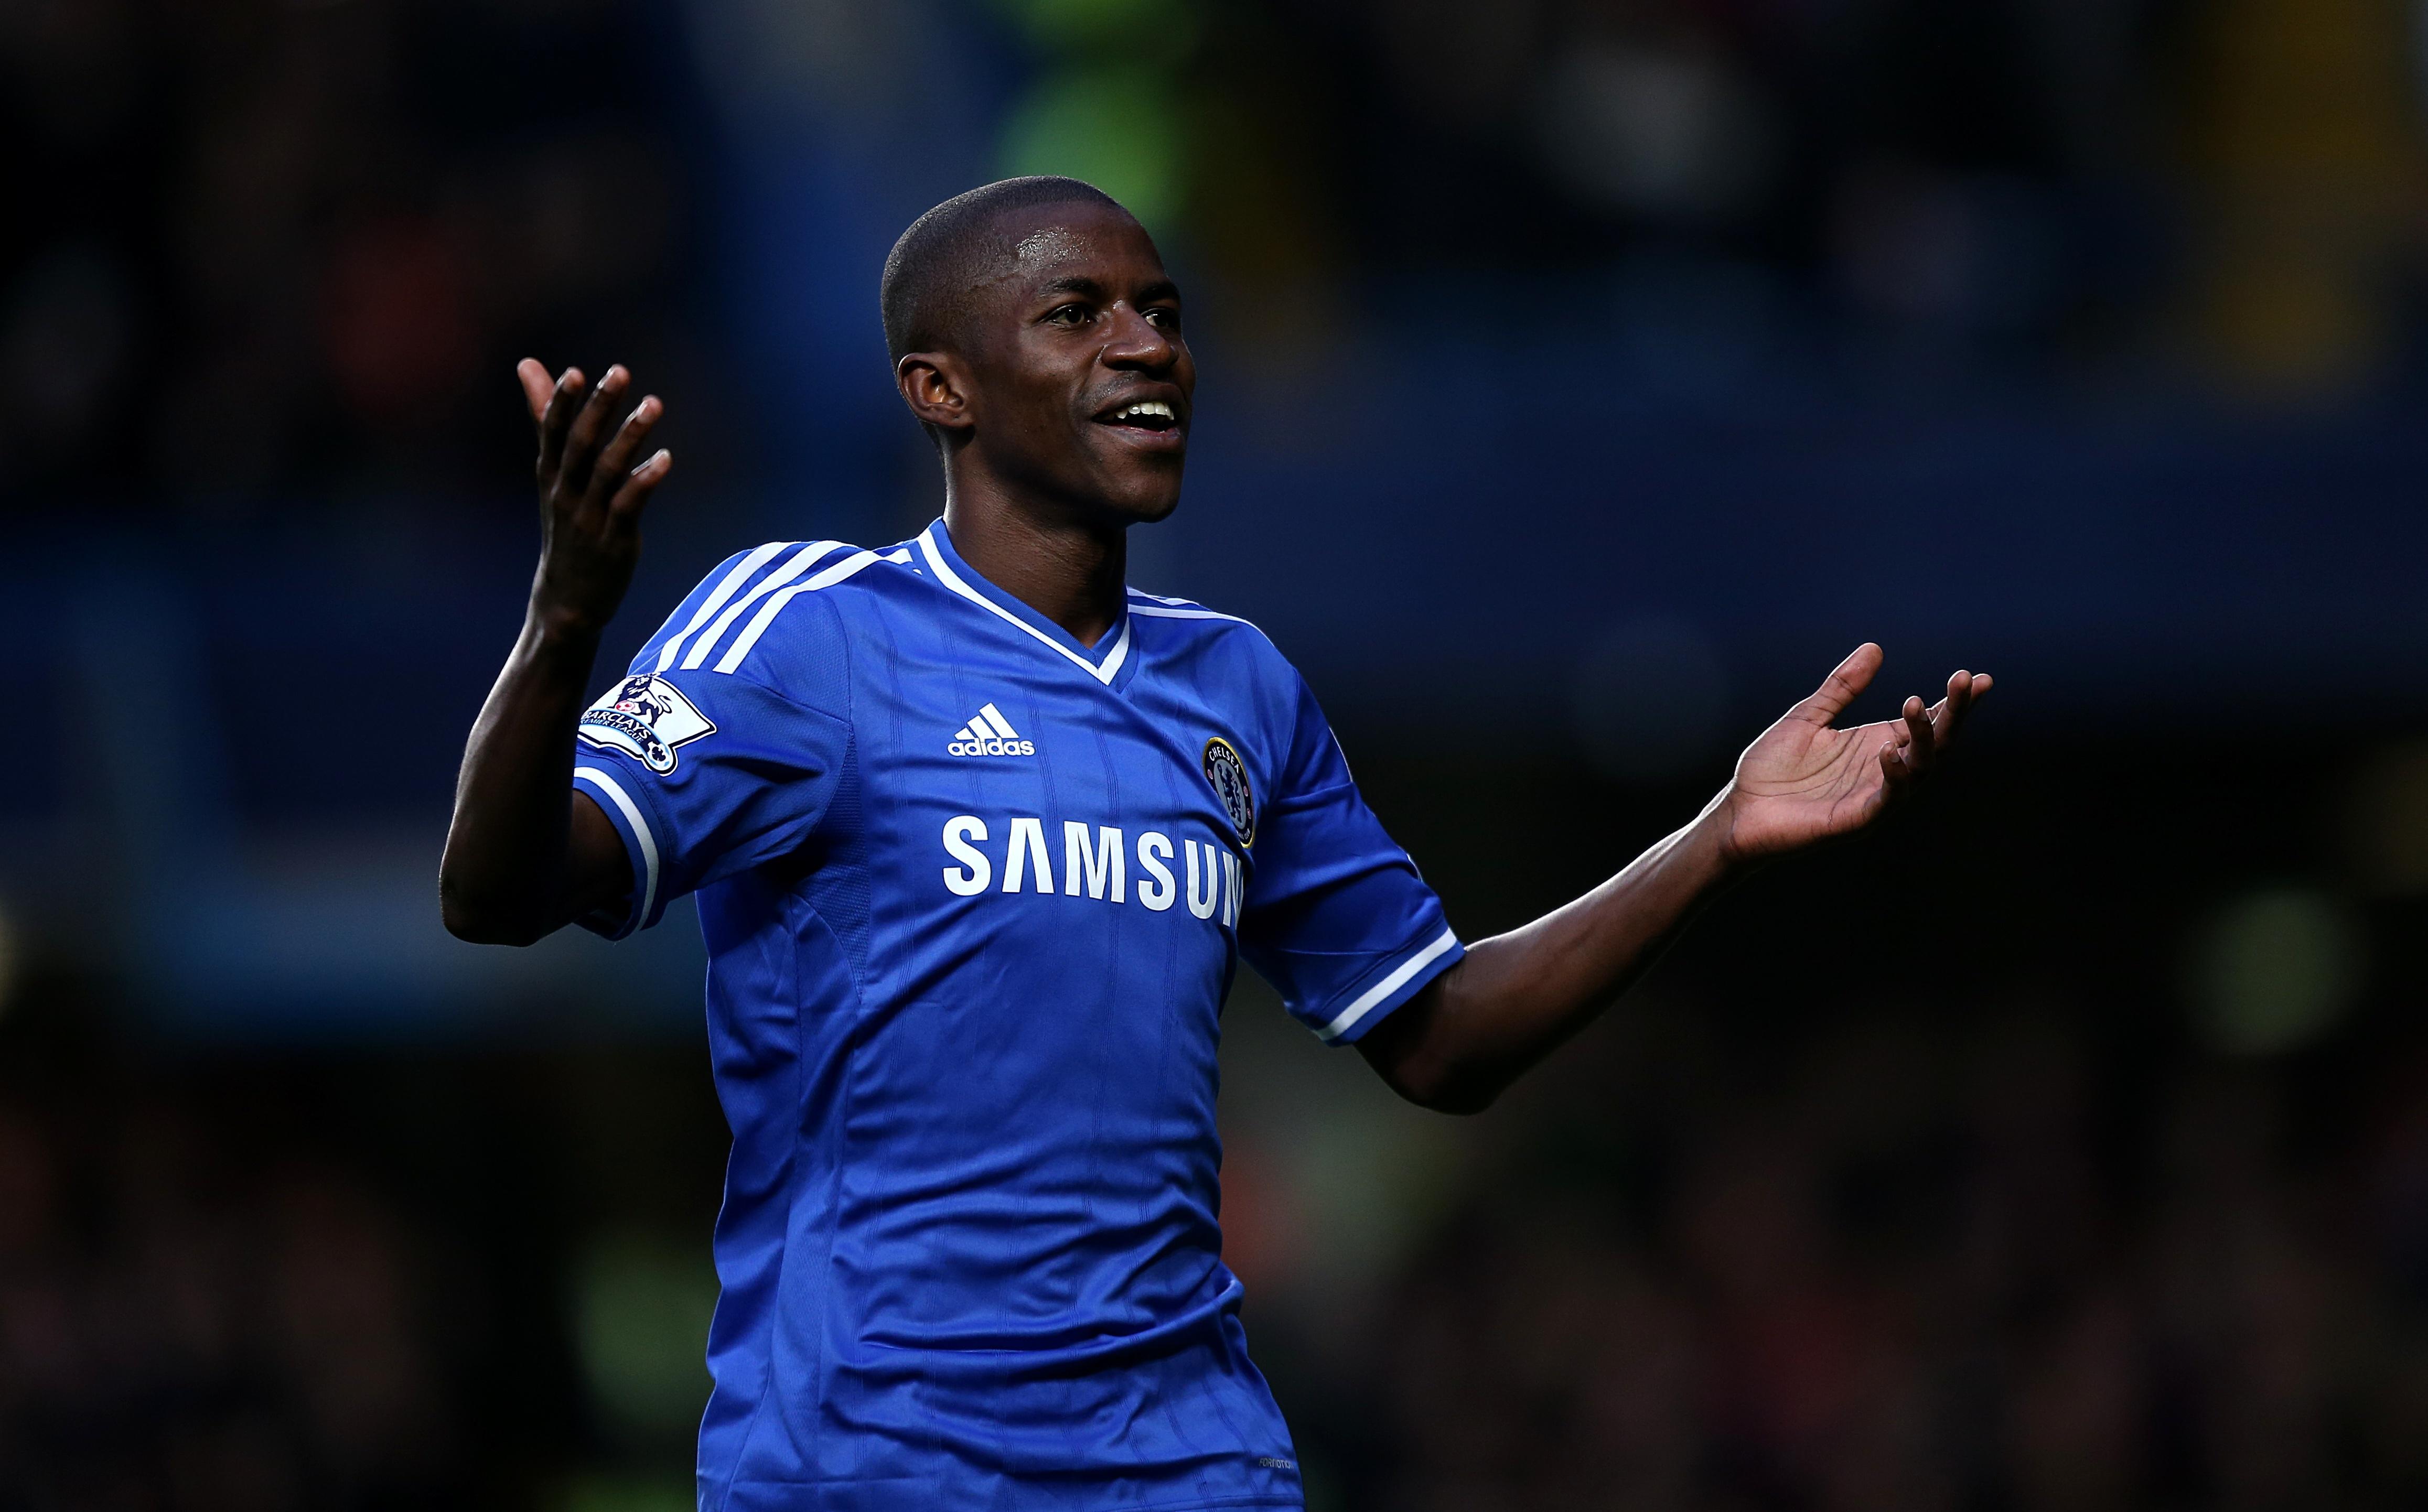 Former Chelsea Midfielder Ramires To Join European Giant In